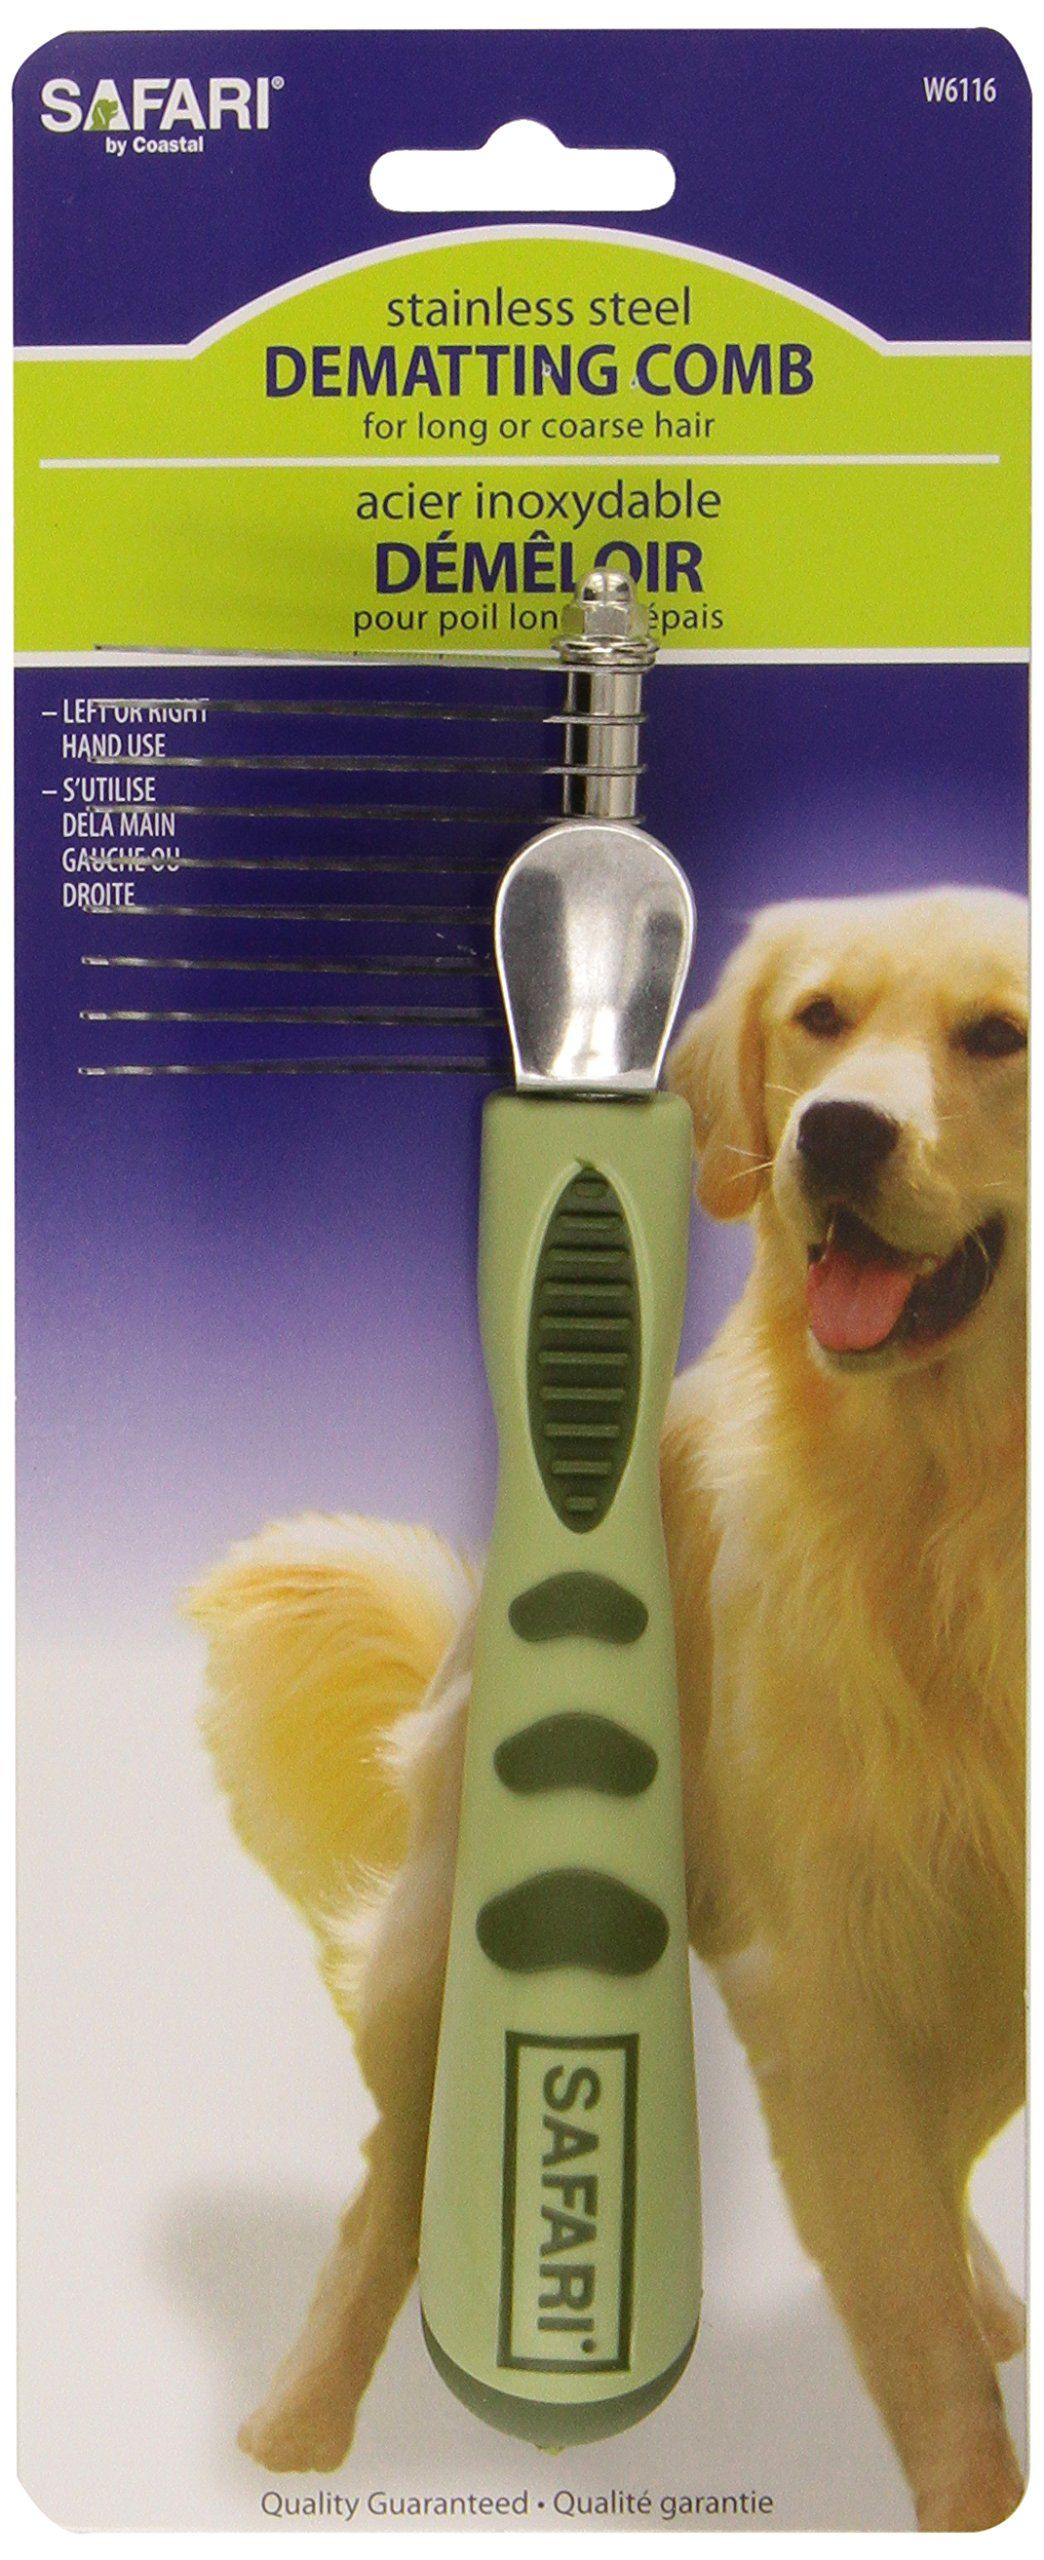 Safari Dog DeMatting Comb, One Size, Dog Comb, Dematting